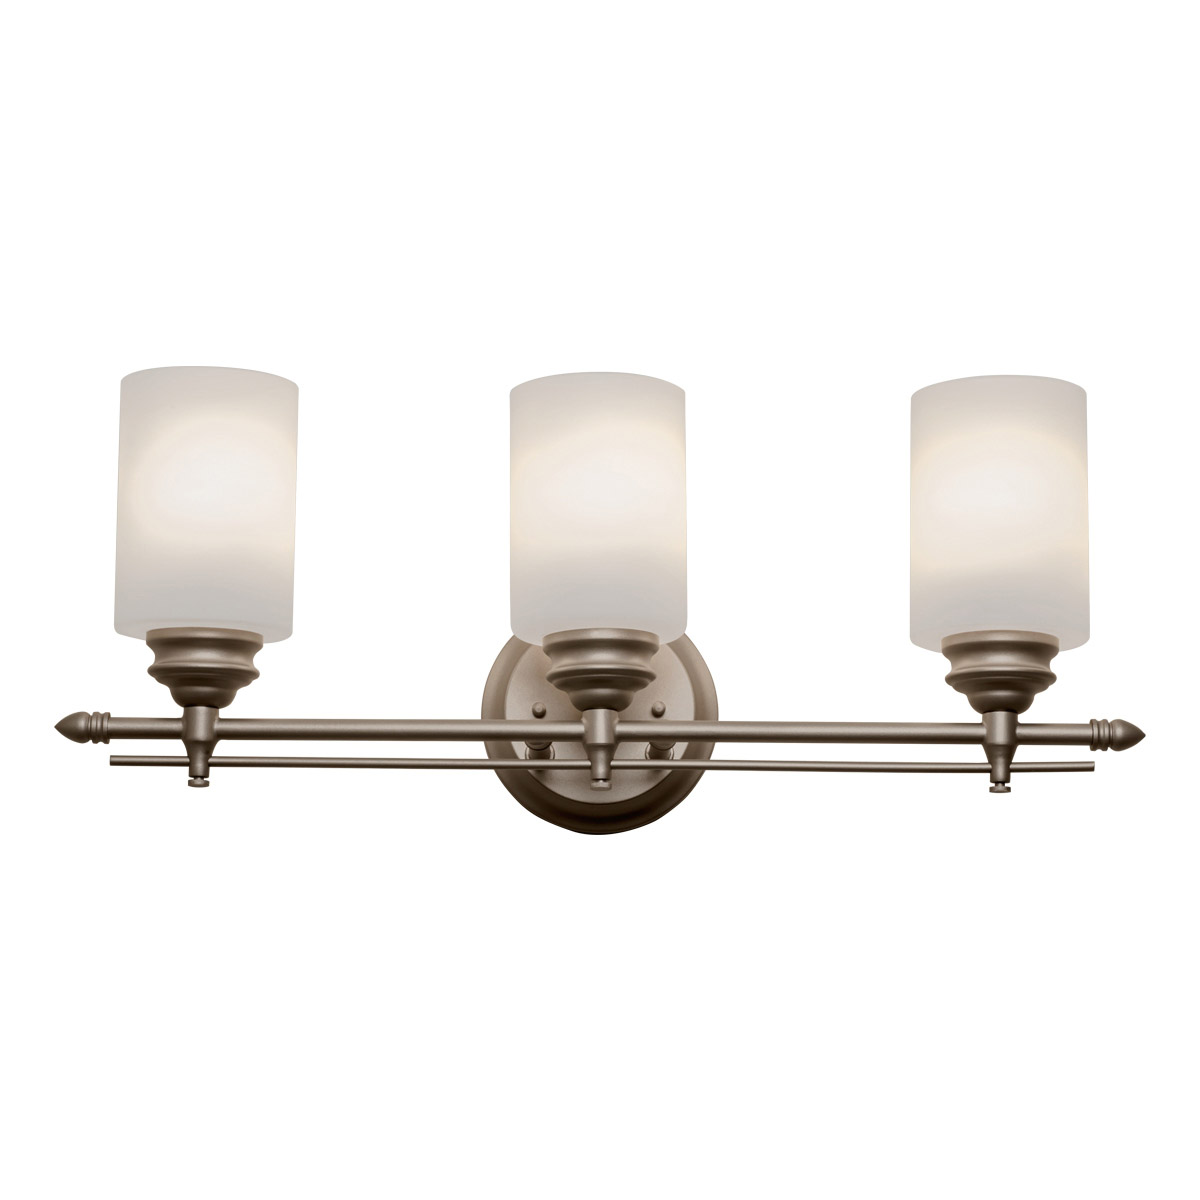 Vanity Lights Revit : Brownlee Lighting - Decorative, Specification Grade LED Lighting. Since 1977.